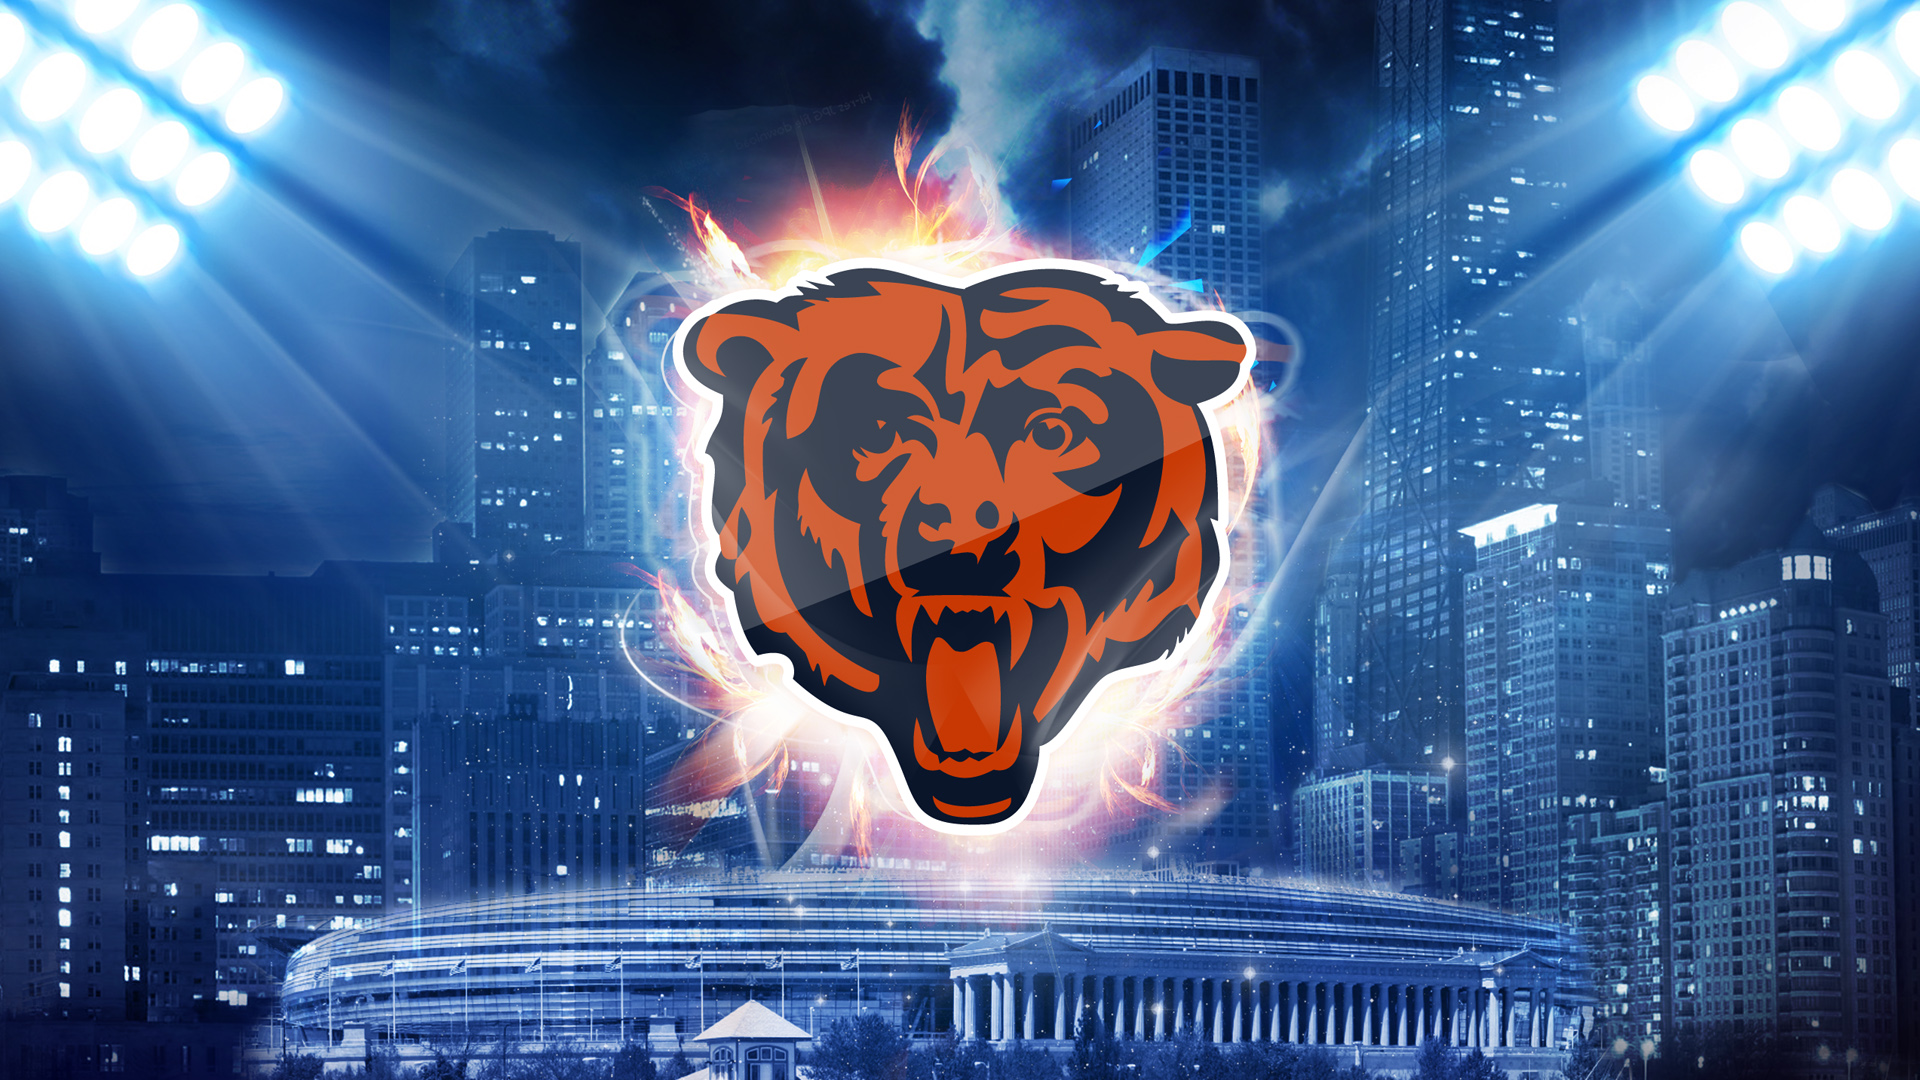 chicago bears desktop wallpaper 52903